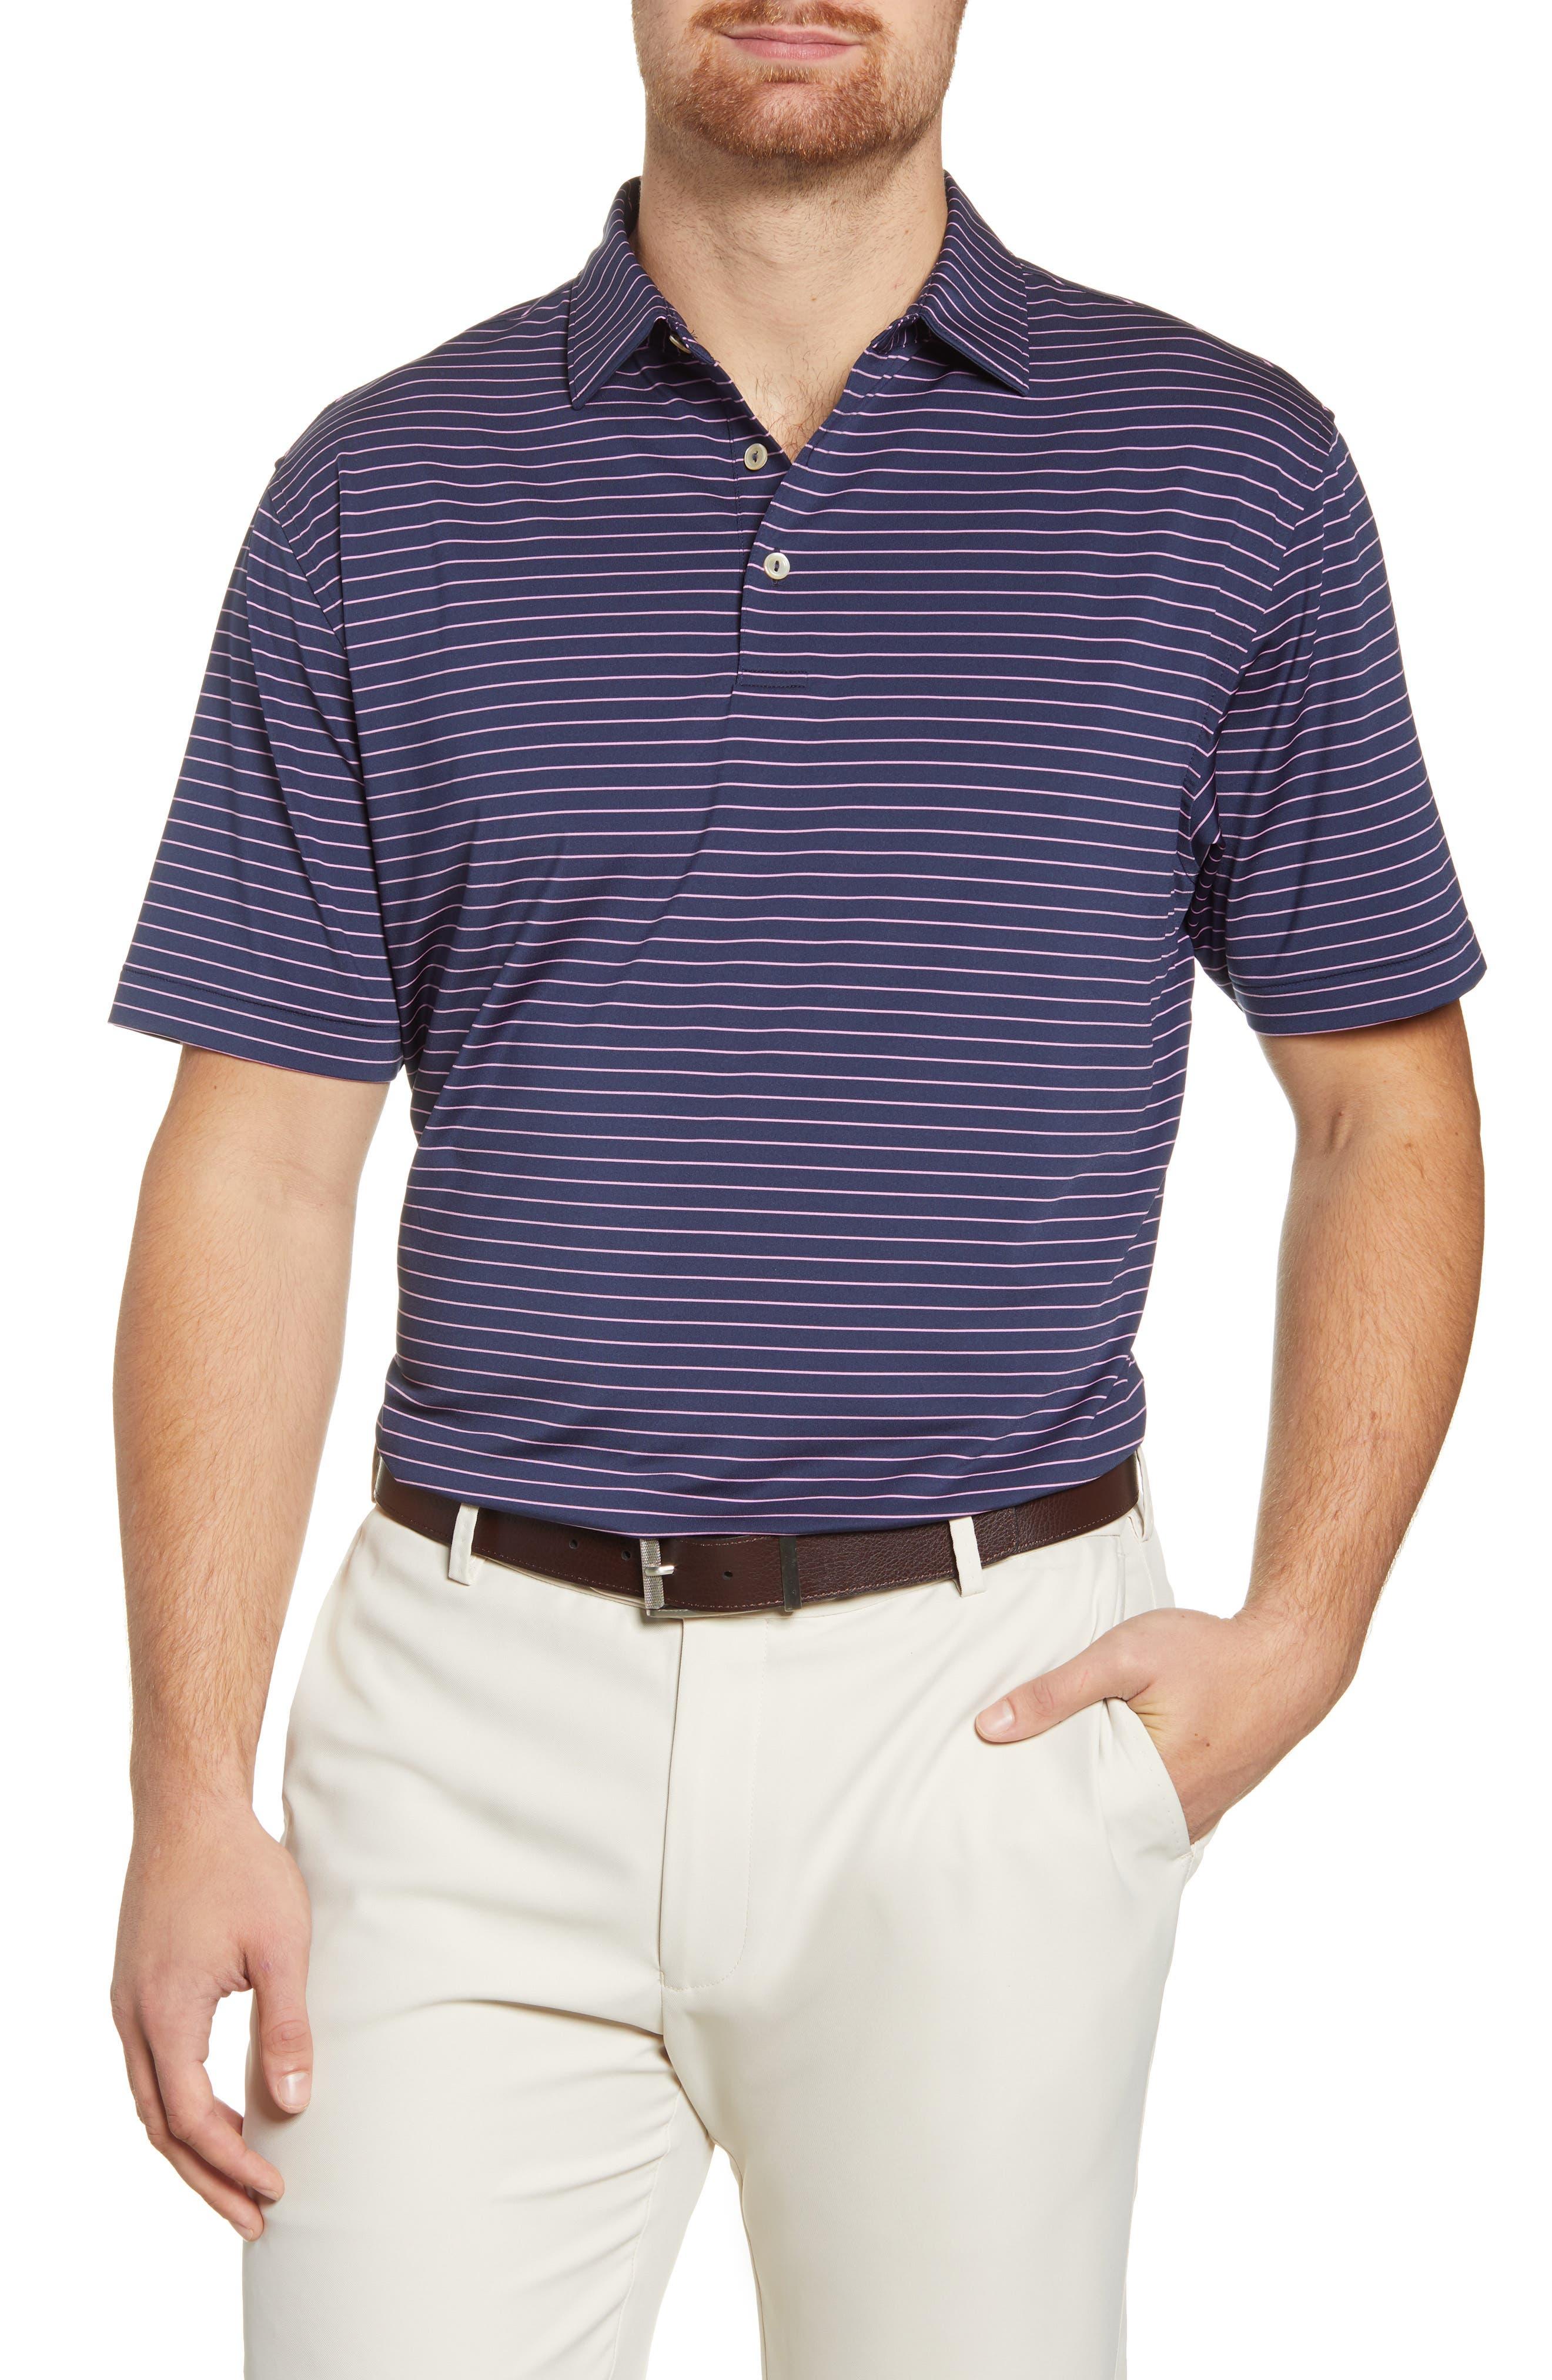 Bond /& Co Size X-Small Seaside Summer Denim Dog Shirt Medium